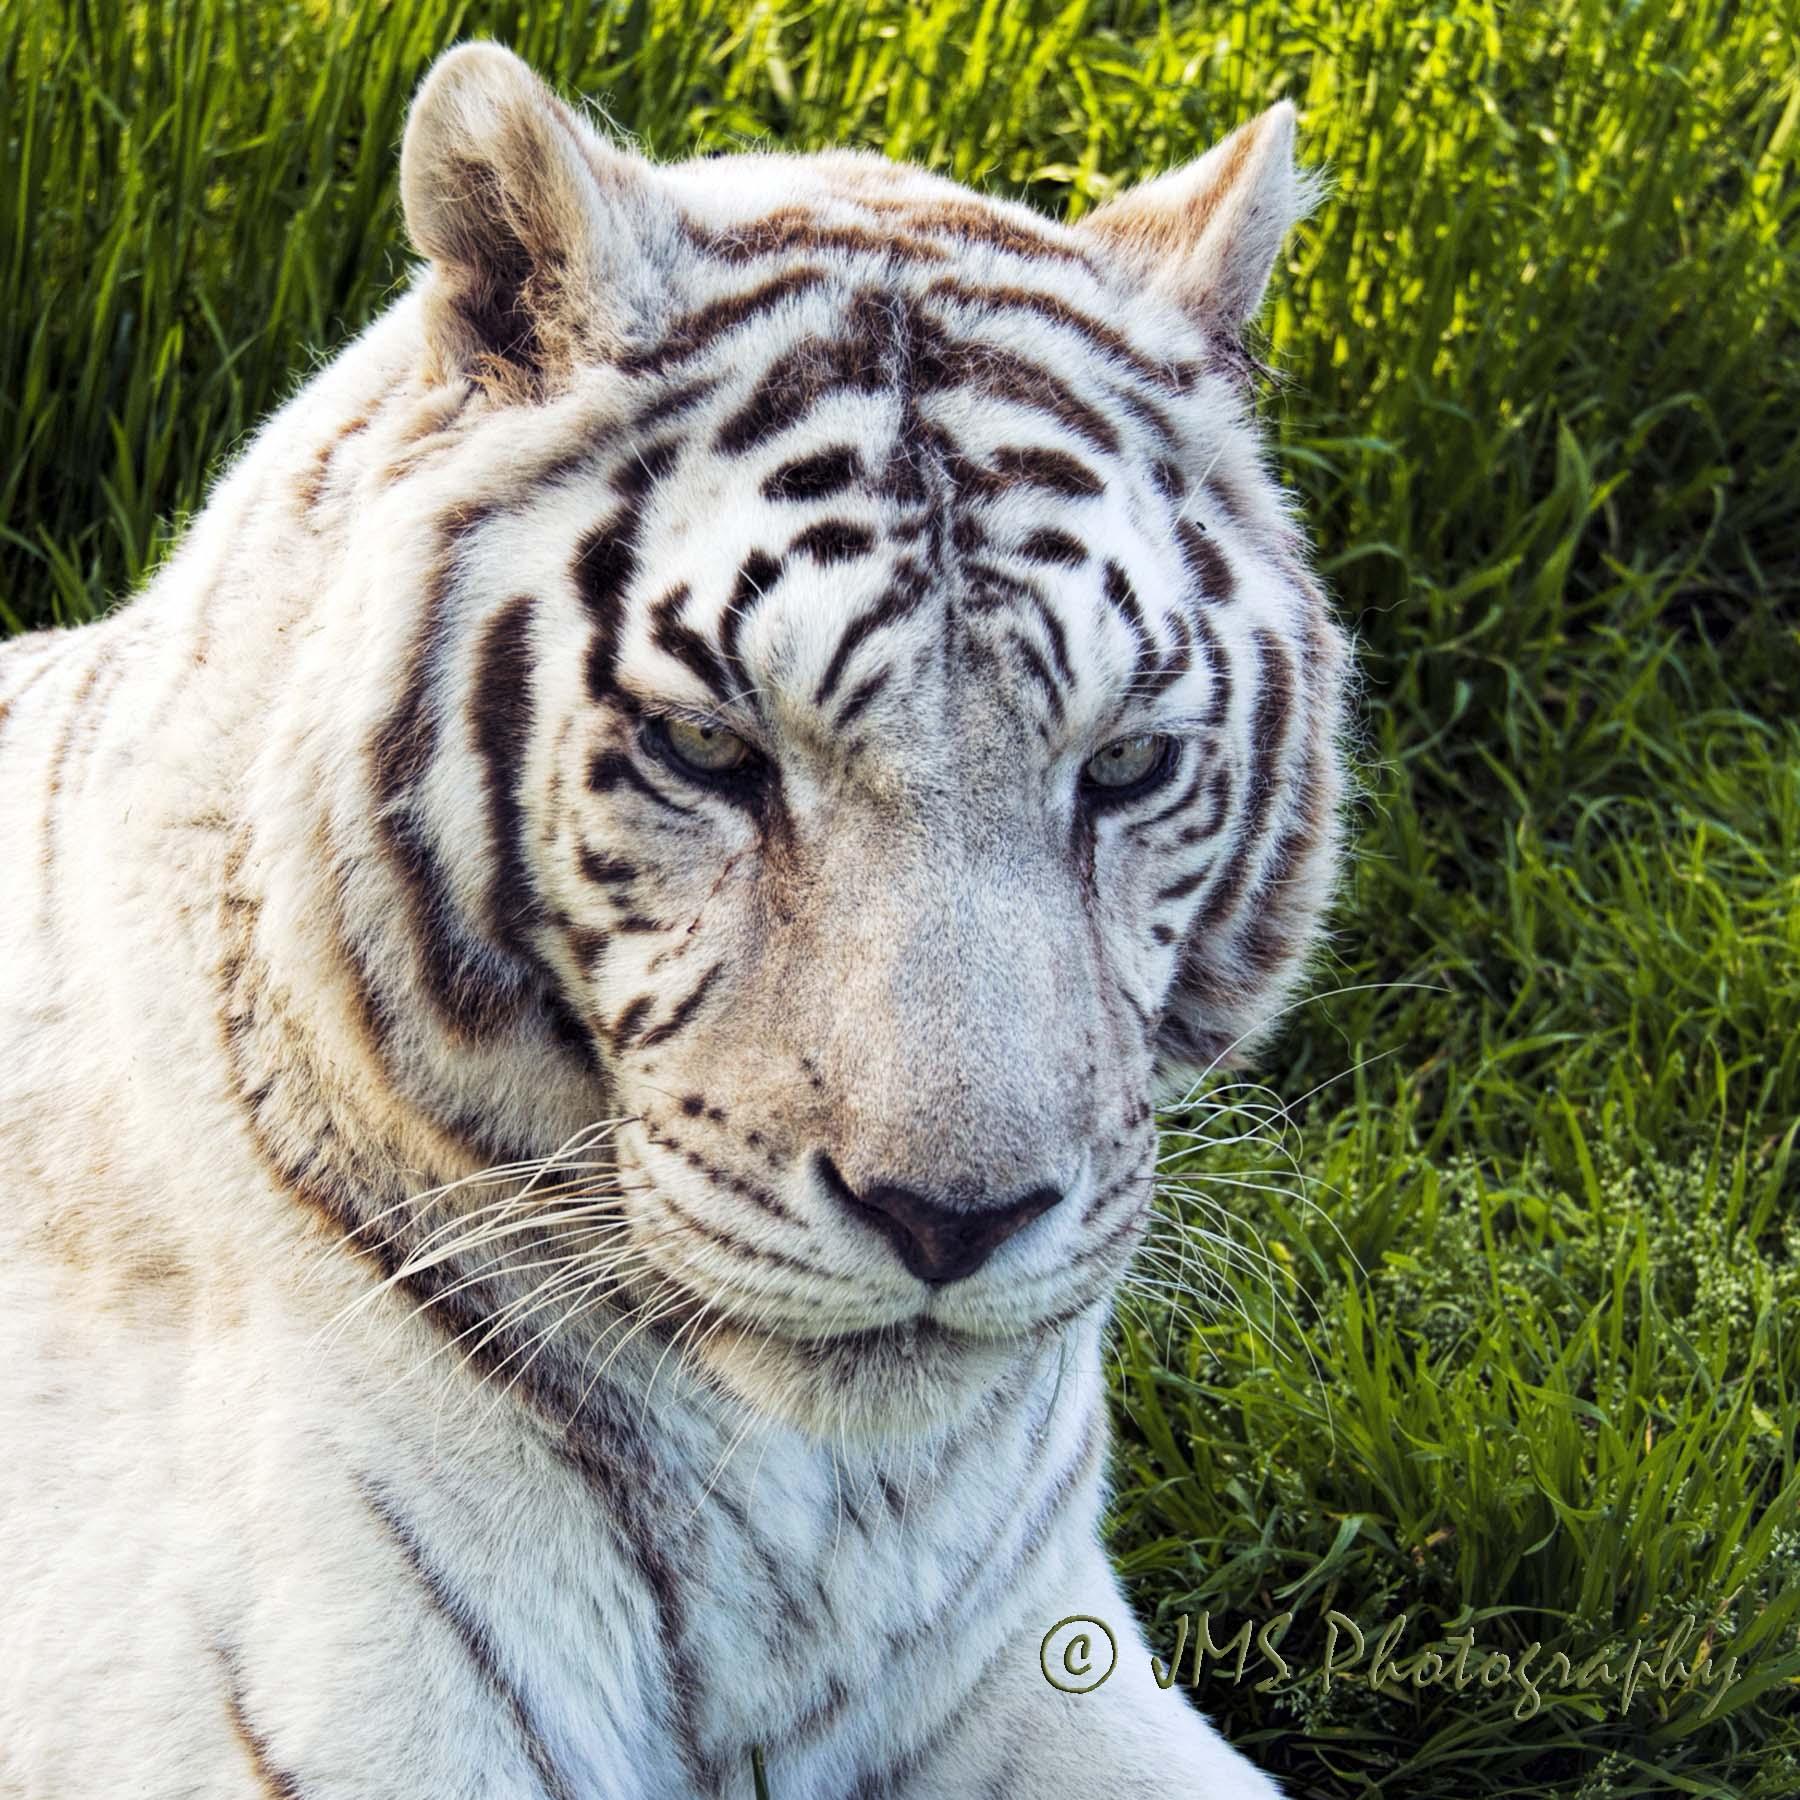 White Tiger named Loretta